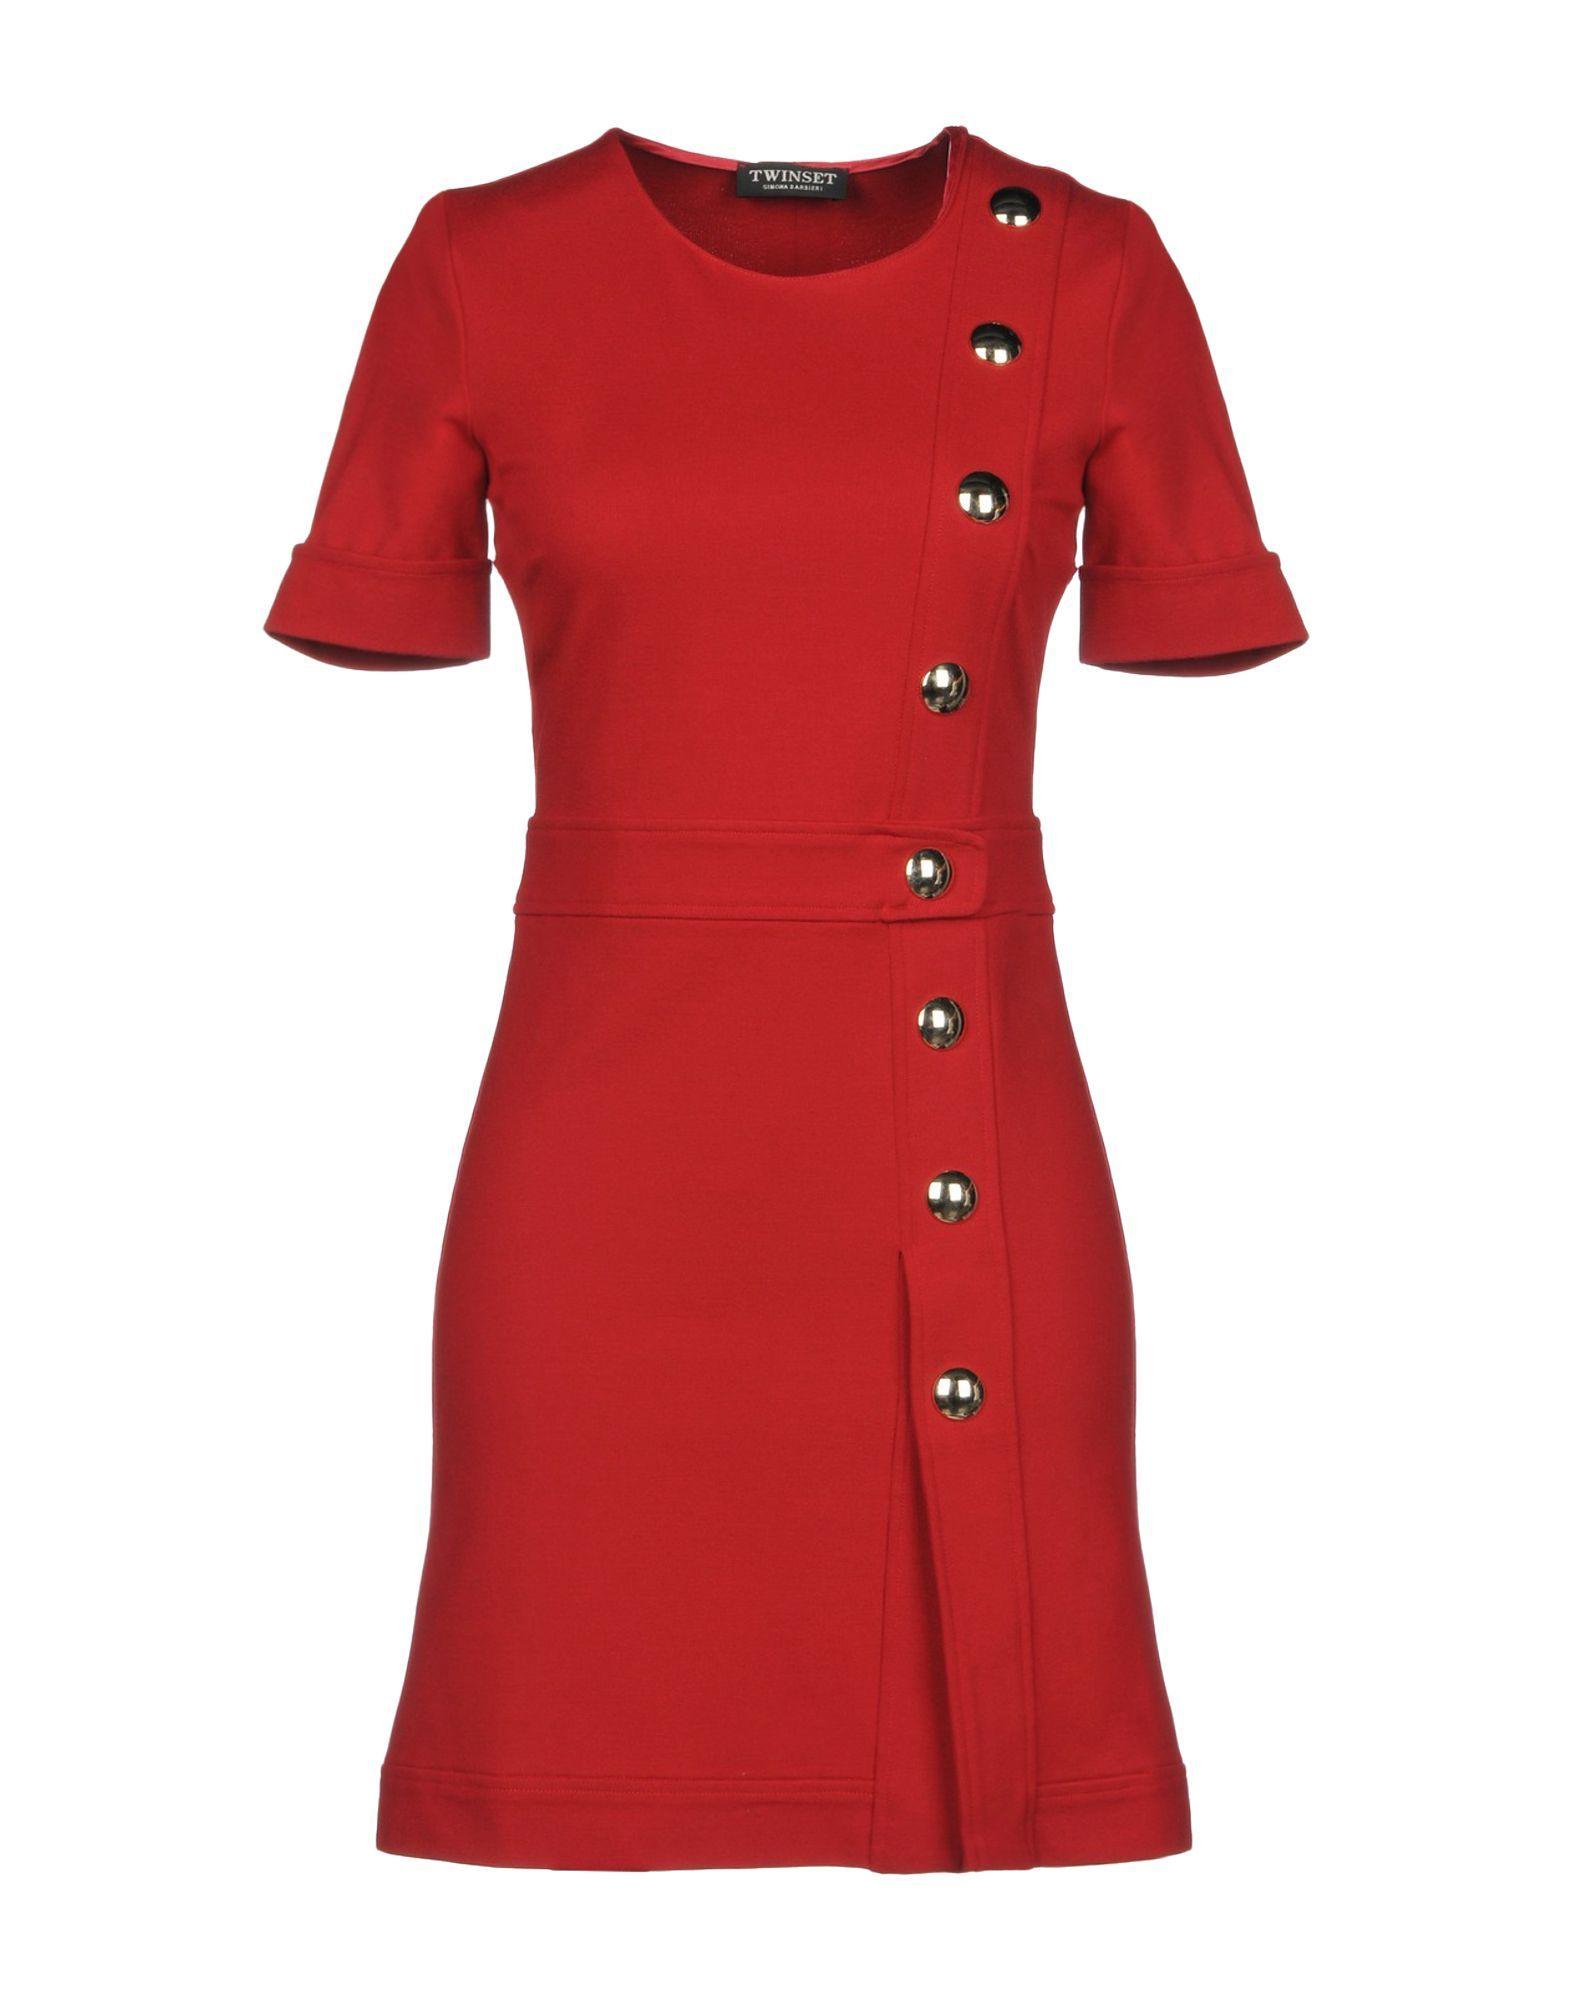 Twinset Red Short Sleeve Dress